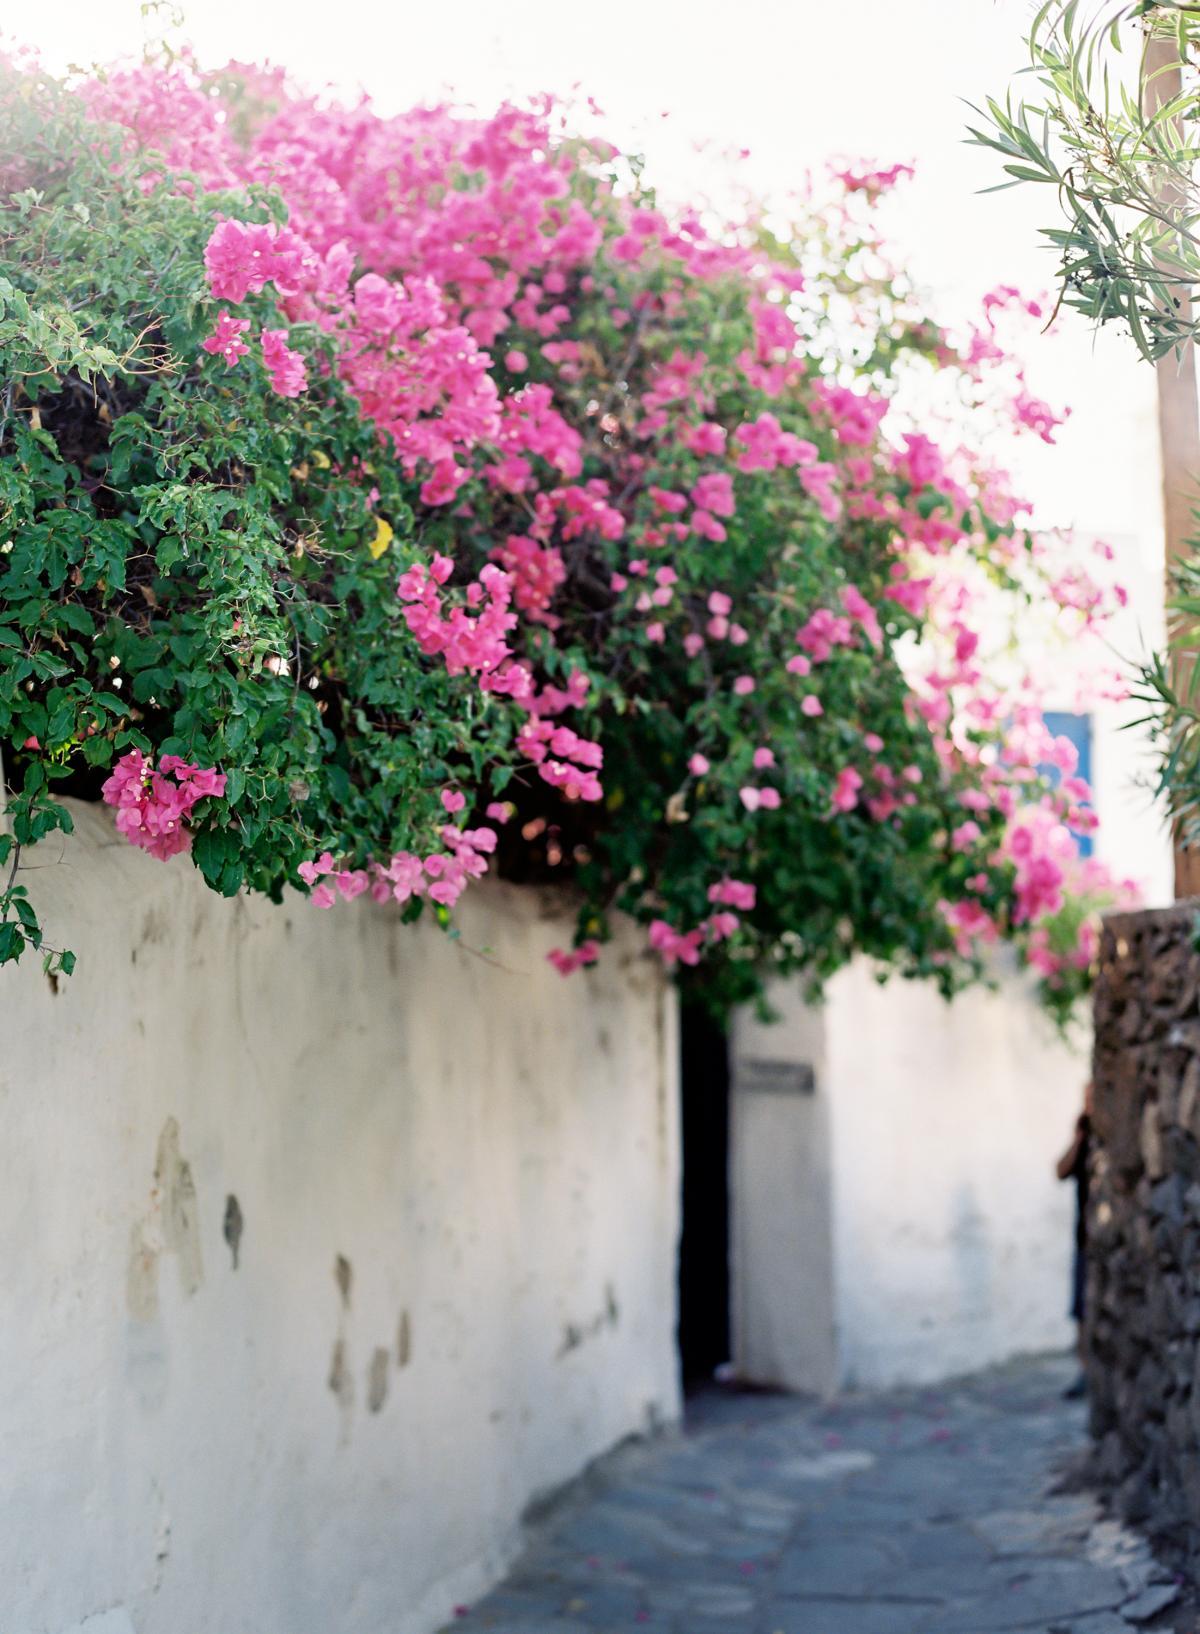 Mykonos greece travel photos by omalley photographers 0005 0007